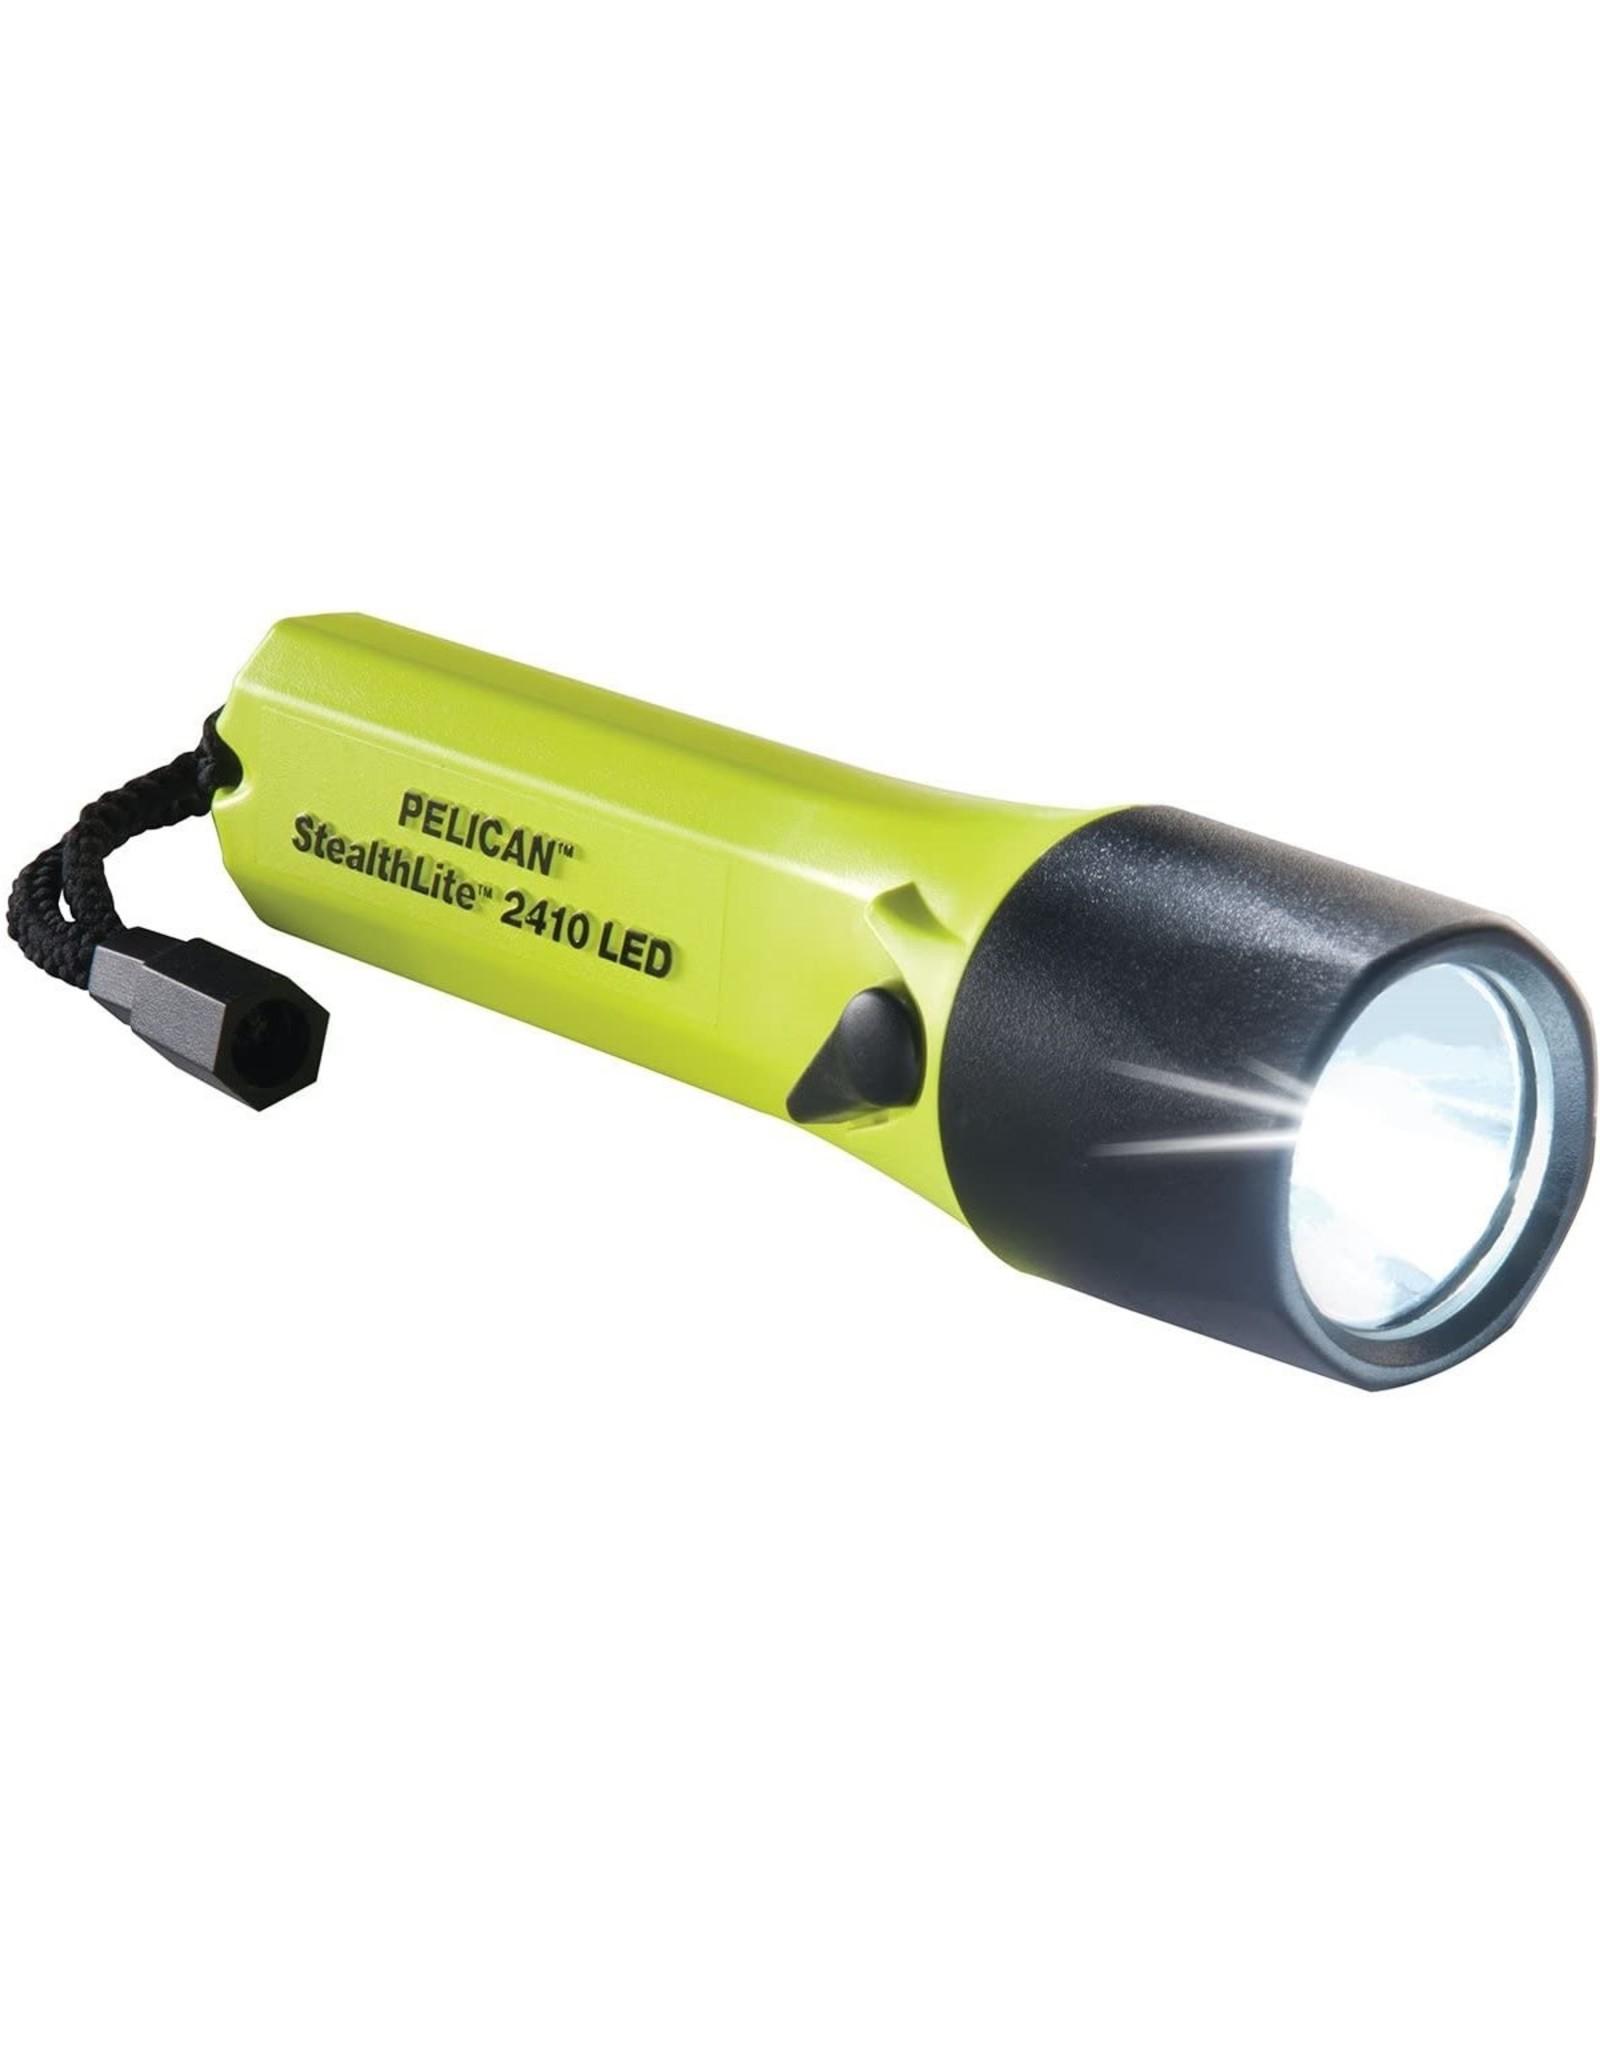 Pelican StealthLite 2410 LED Photoluminescent Flashlight